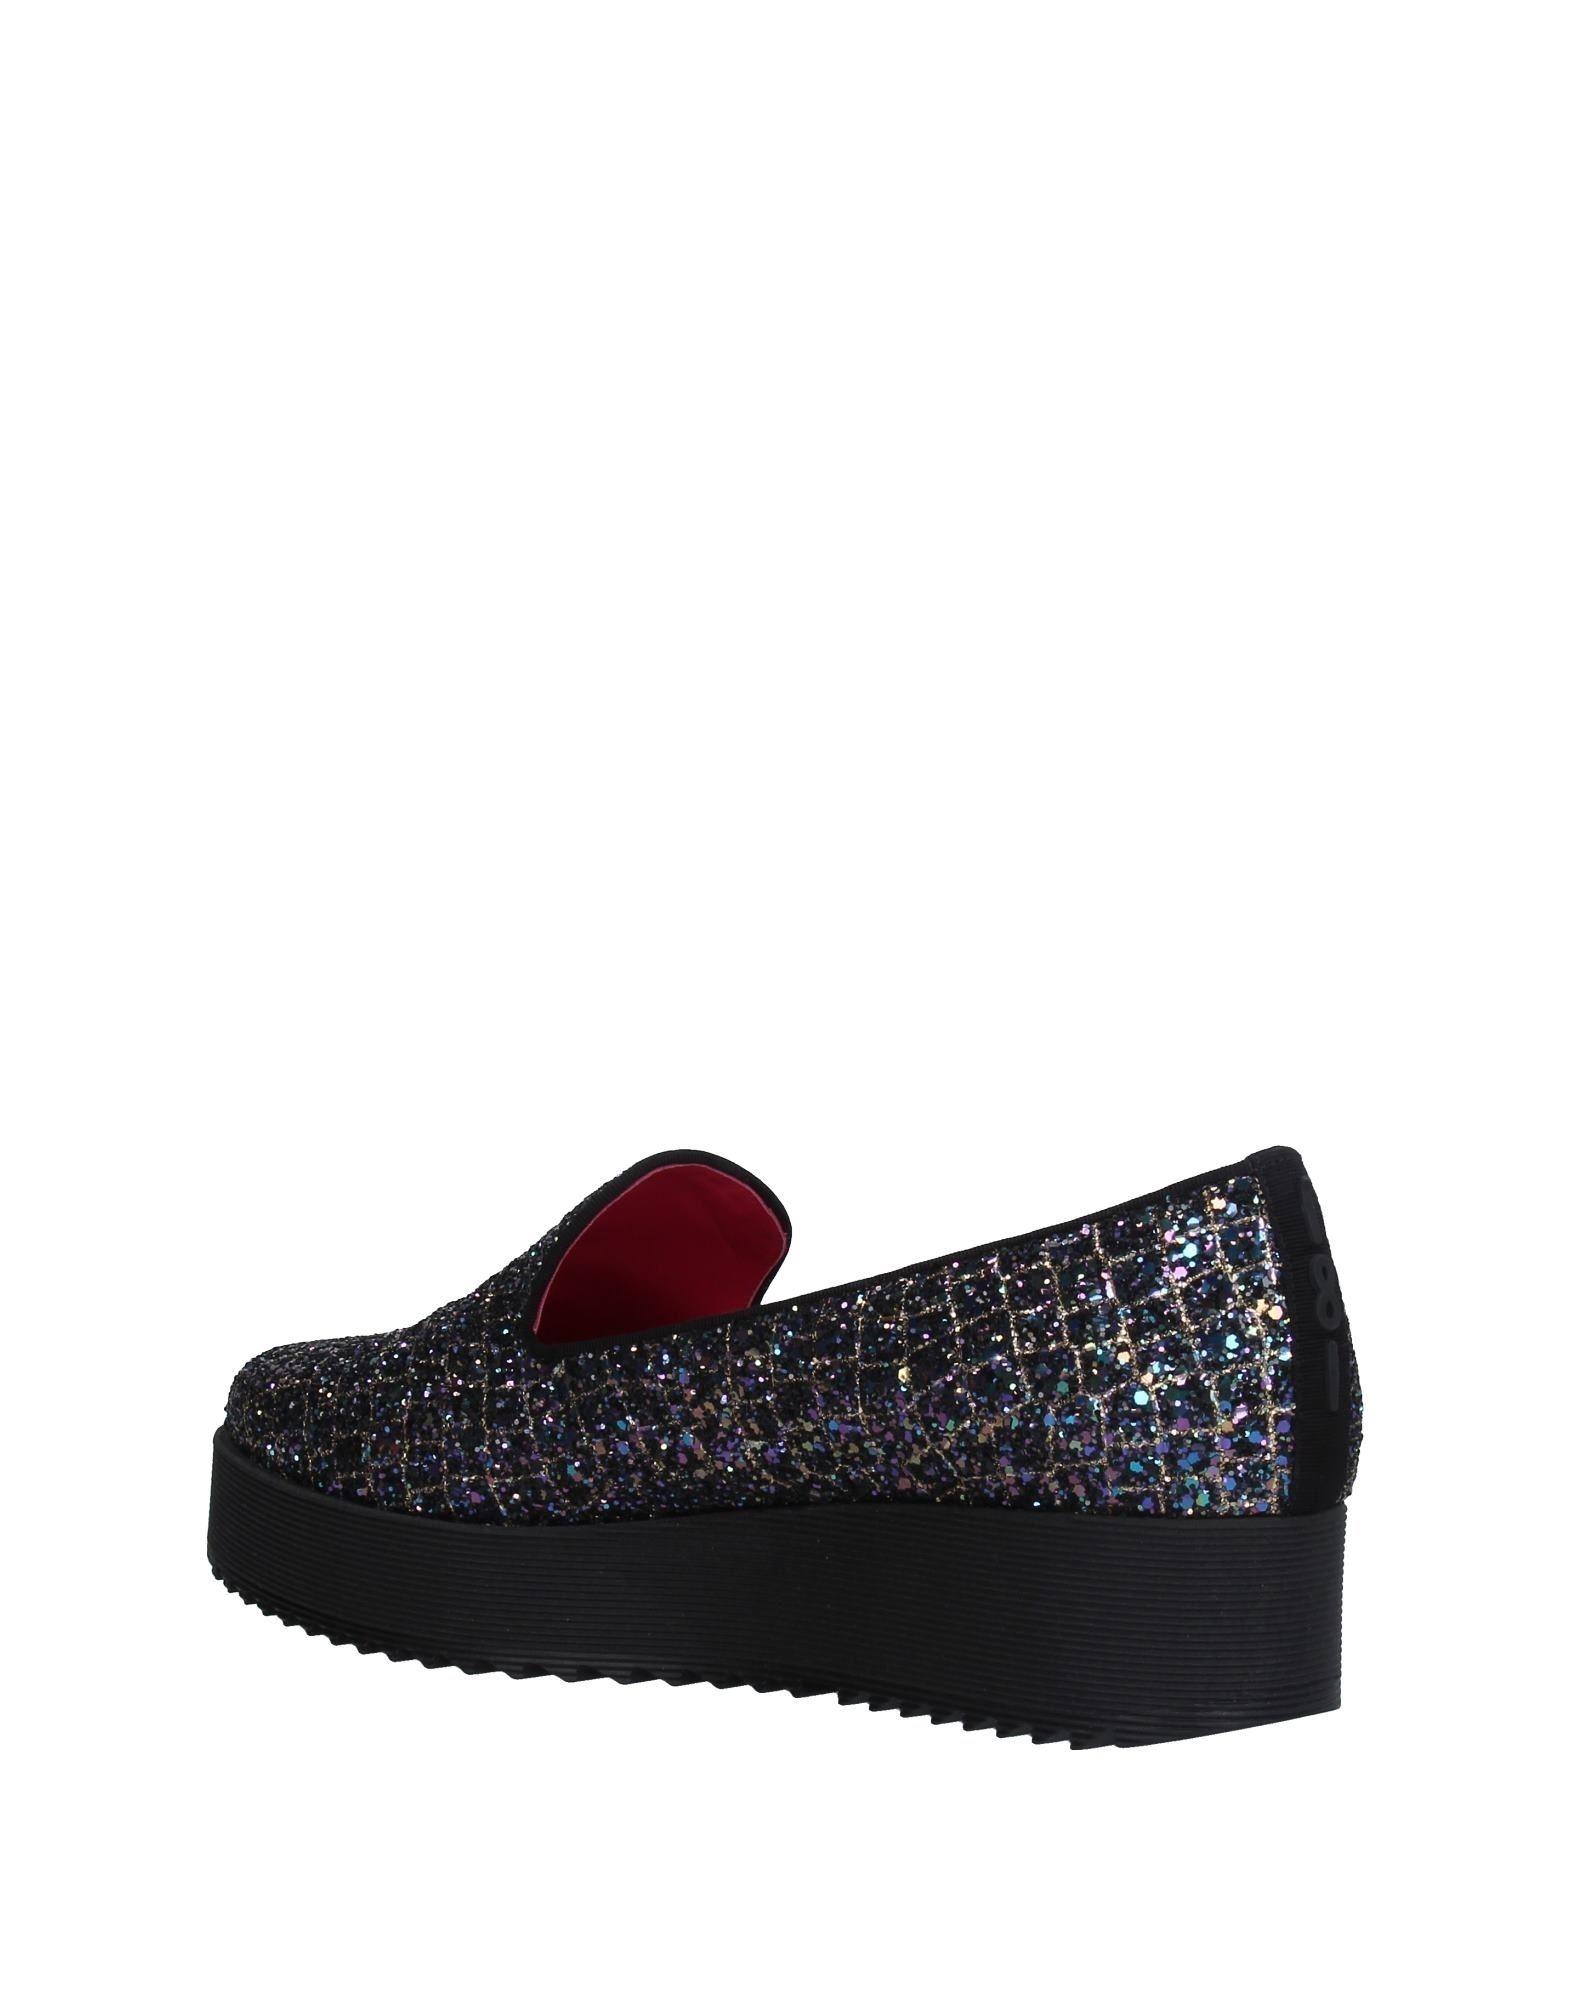 Gut um Sneakers billige Schuhe zu tragen181 By Alberto Gozzi Sneakers um Damen  11218413QD 3b6203